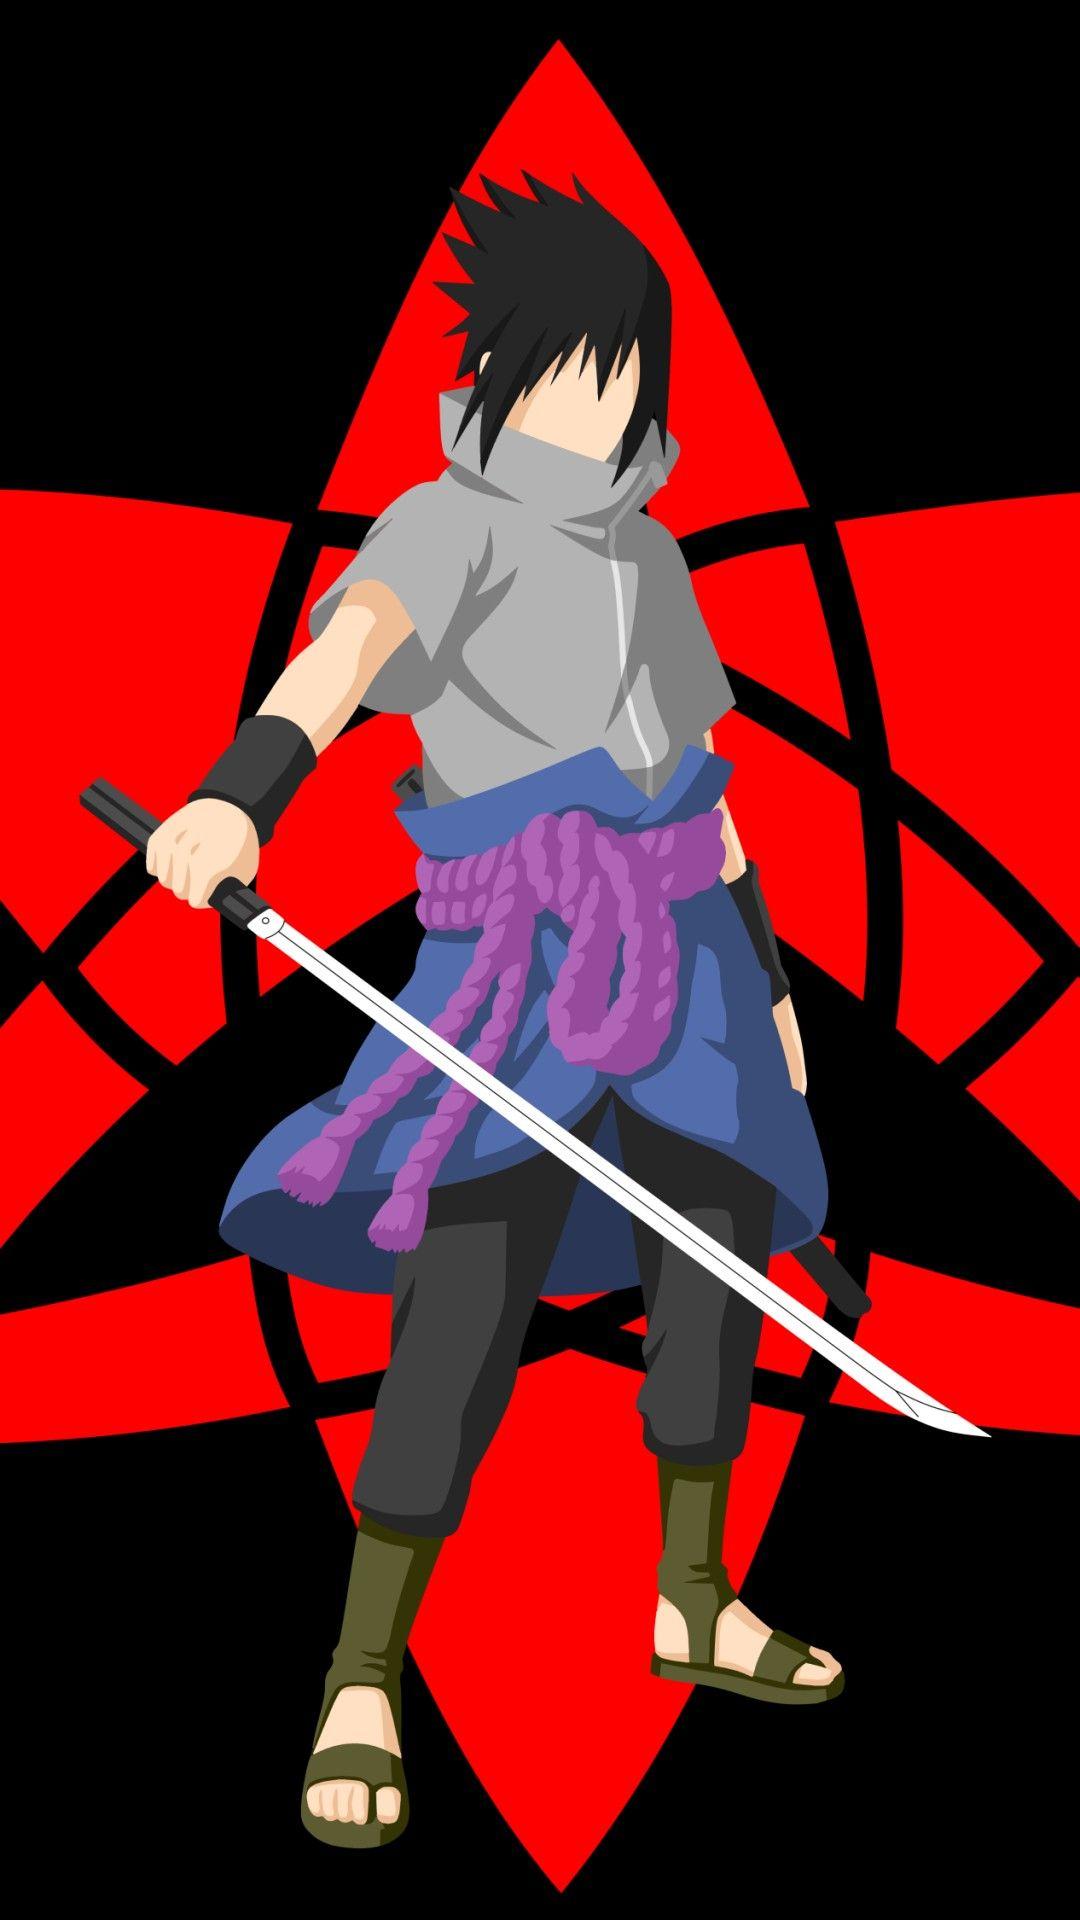 Wallpaper Phone Sasuke Full Hd Naruto Mobile Anime Anime Artwork Wallpaper